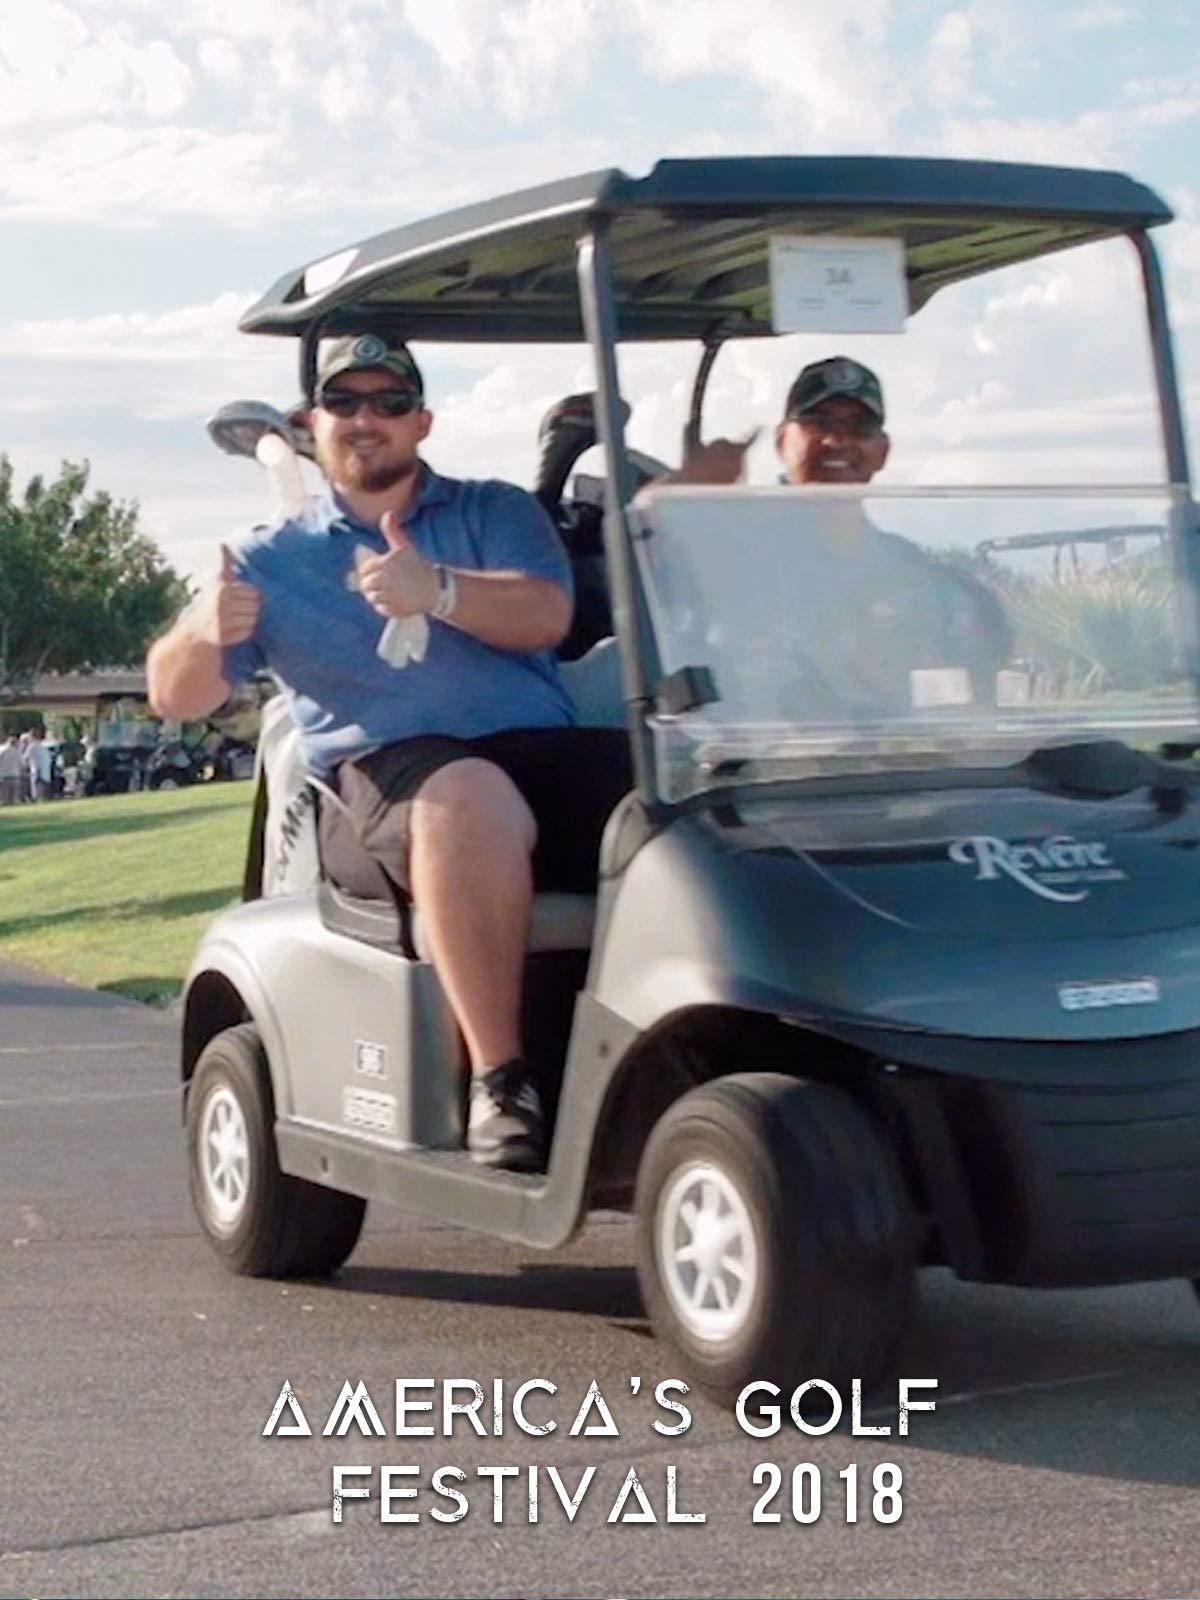 Clip: America's Golf Festival 2018s on Amazon Prime Video UK